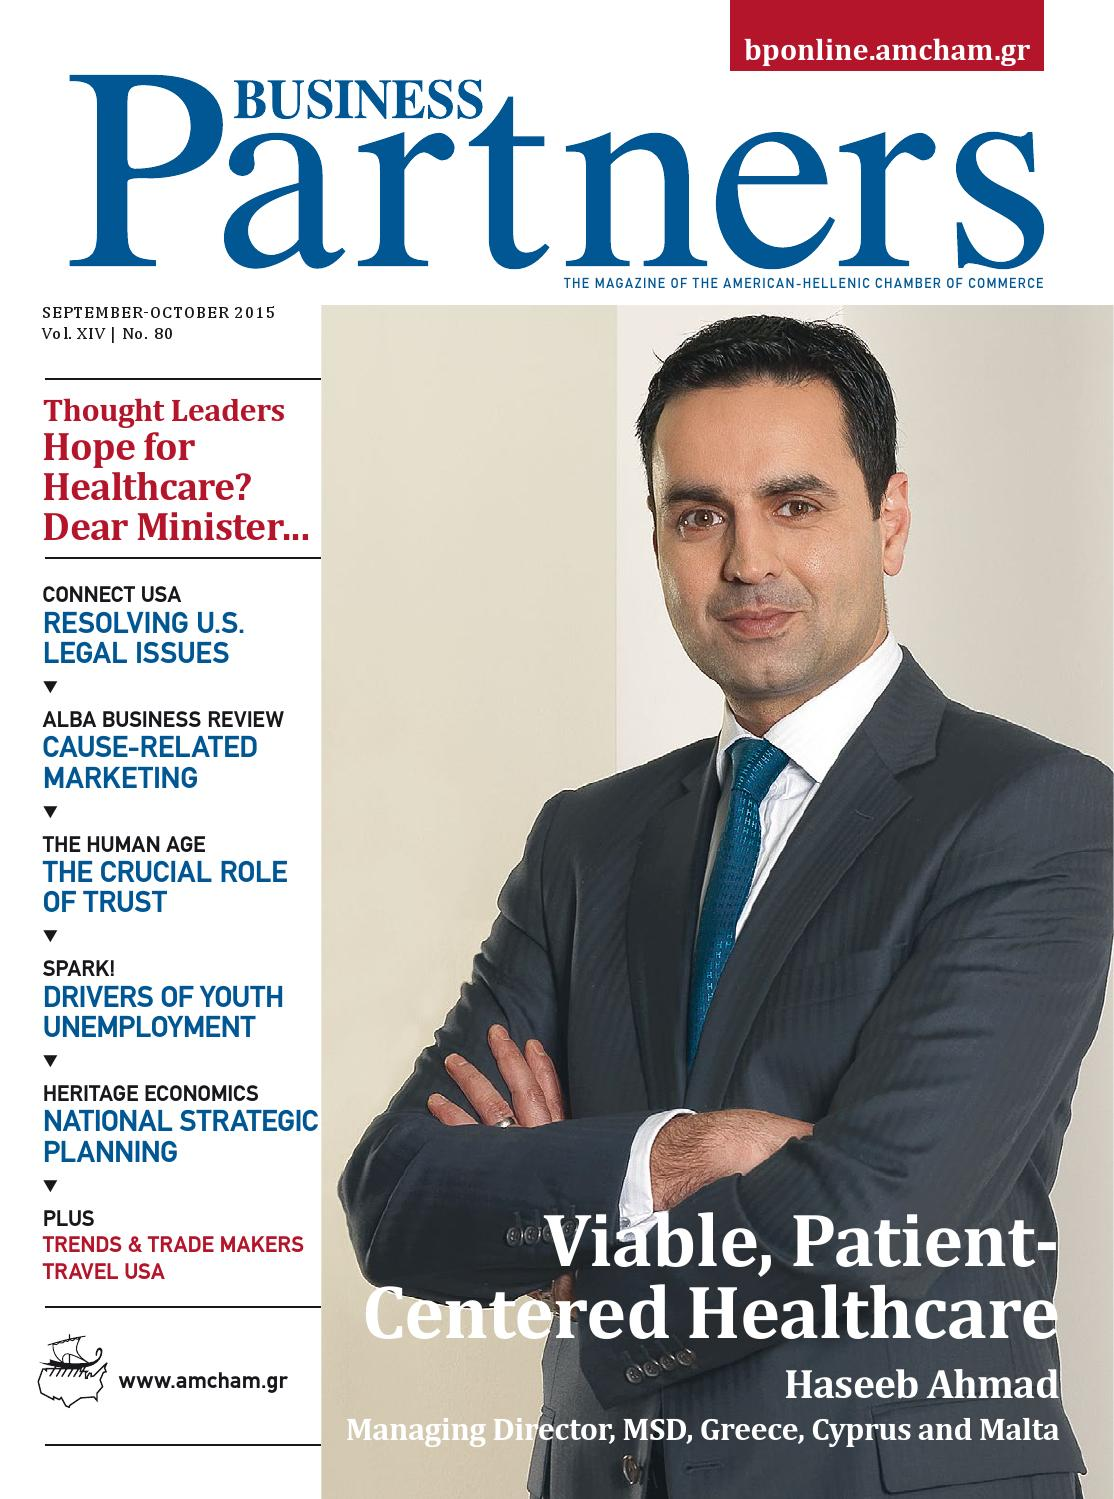 Business Partners | September-October 2015 by Raymond Matera